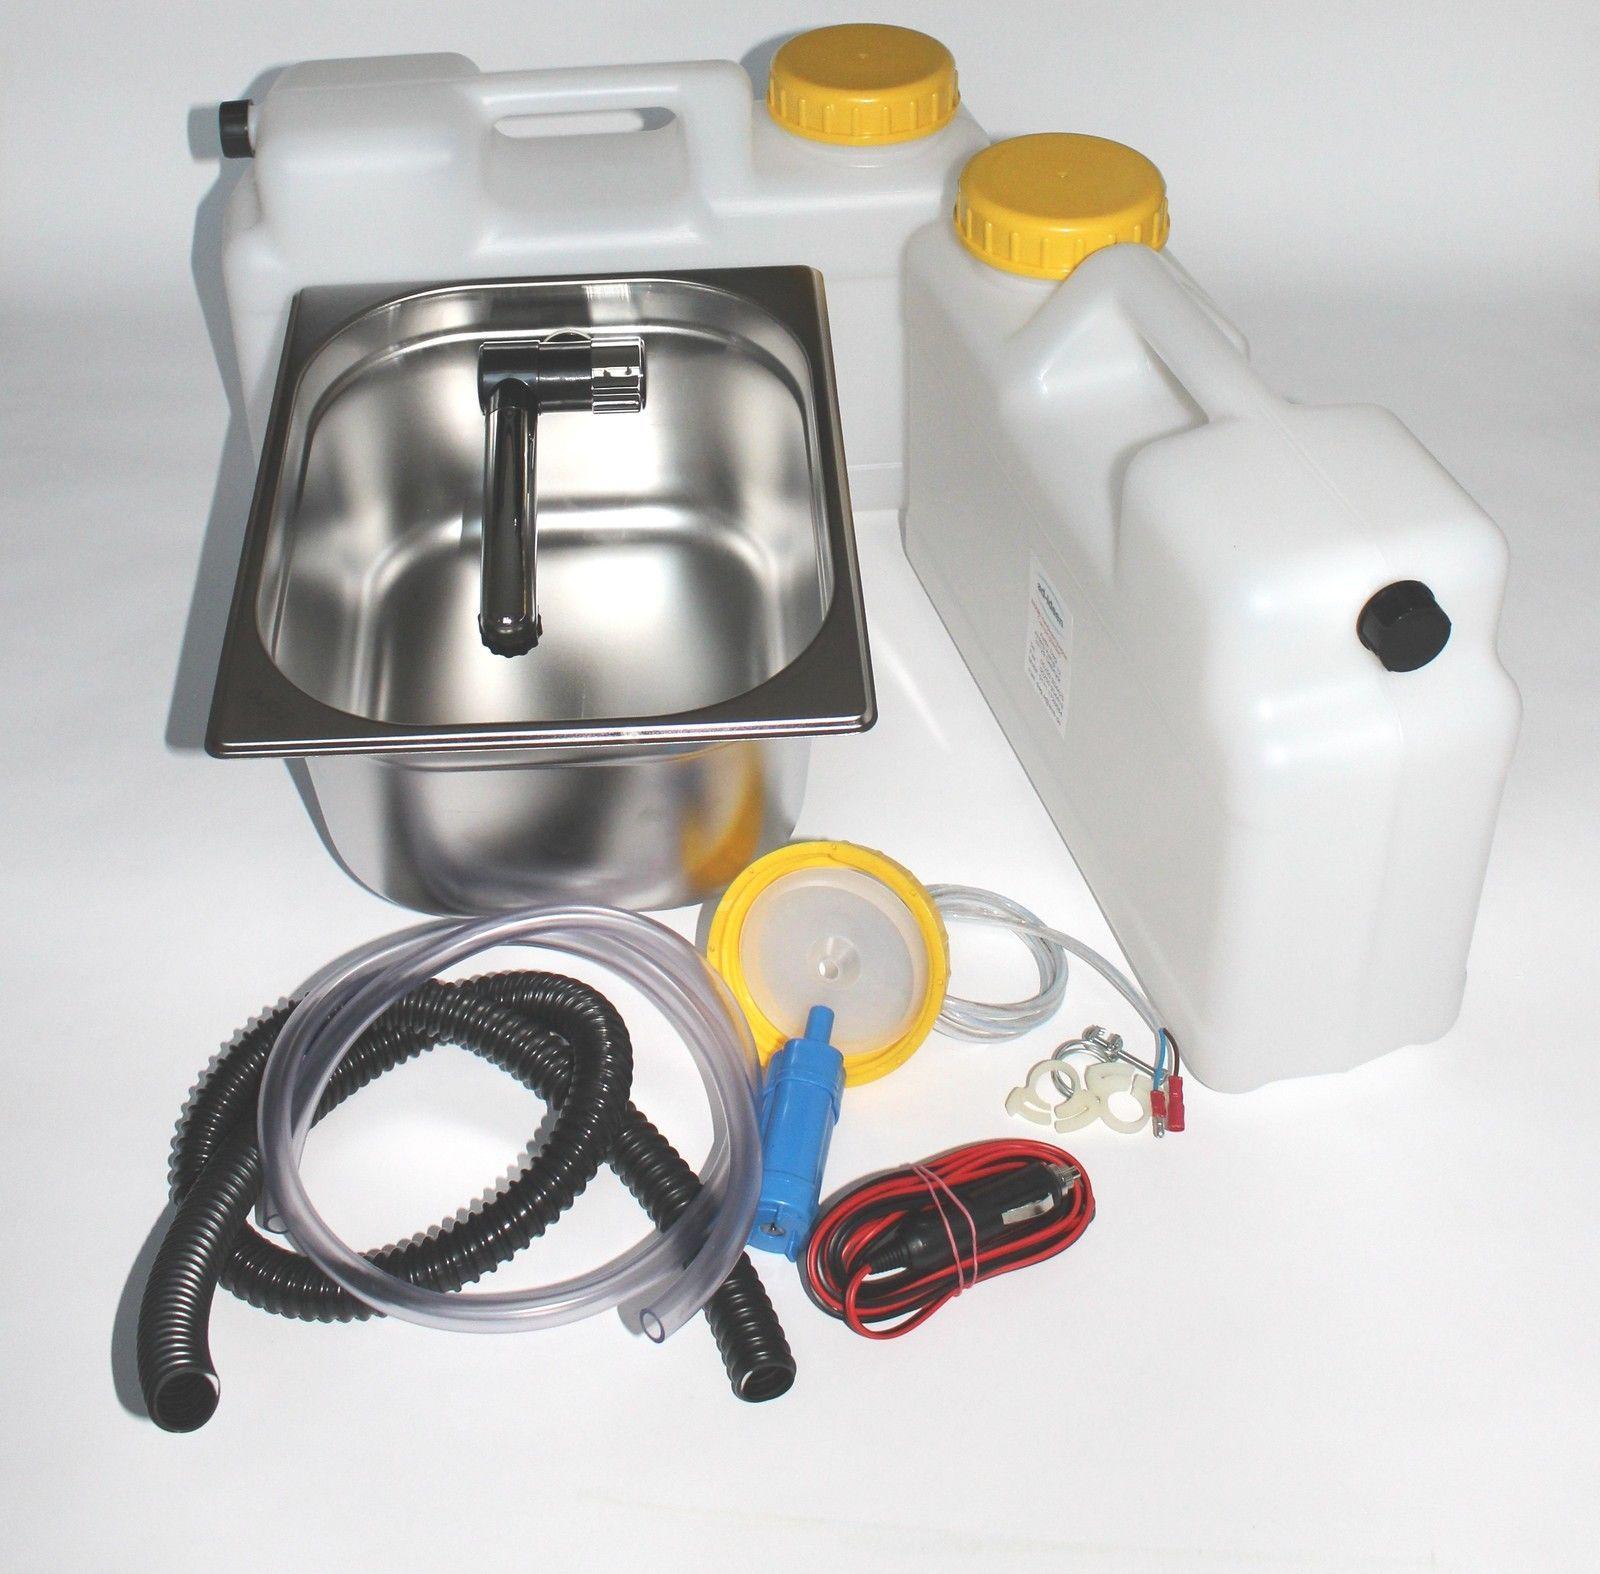 12v Minikuche Technikset Wohnmobil Bausatz Spule 325x265x150mm